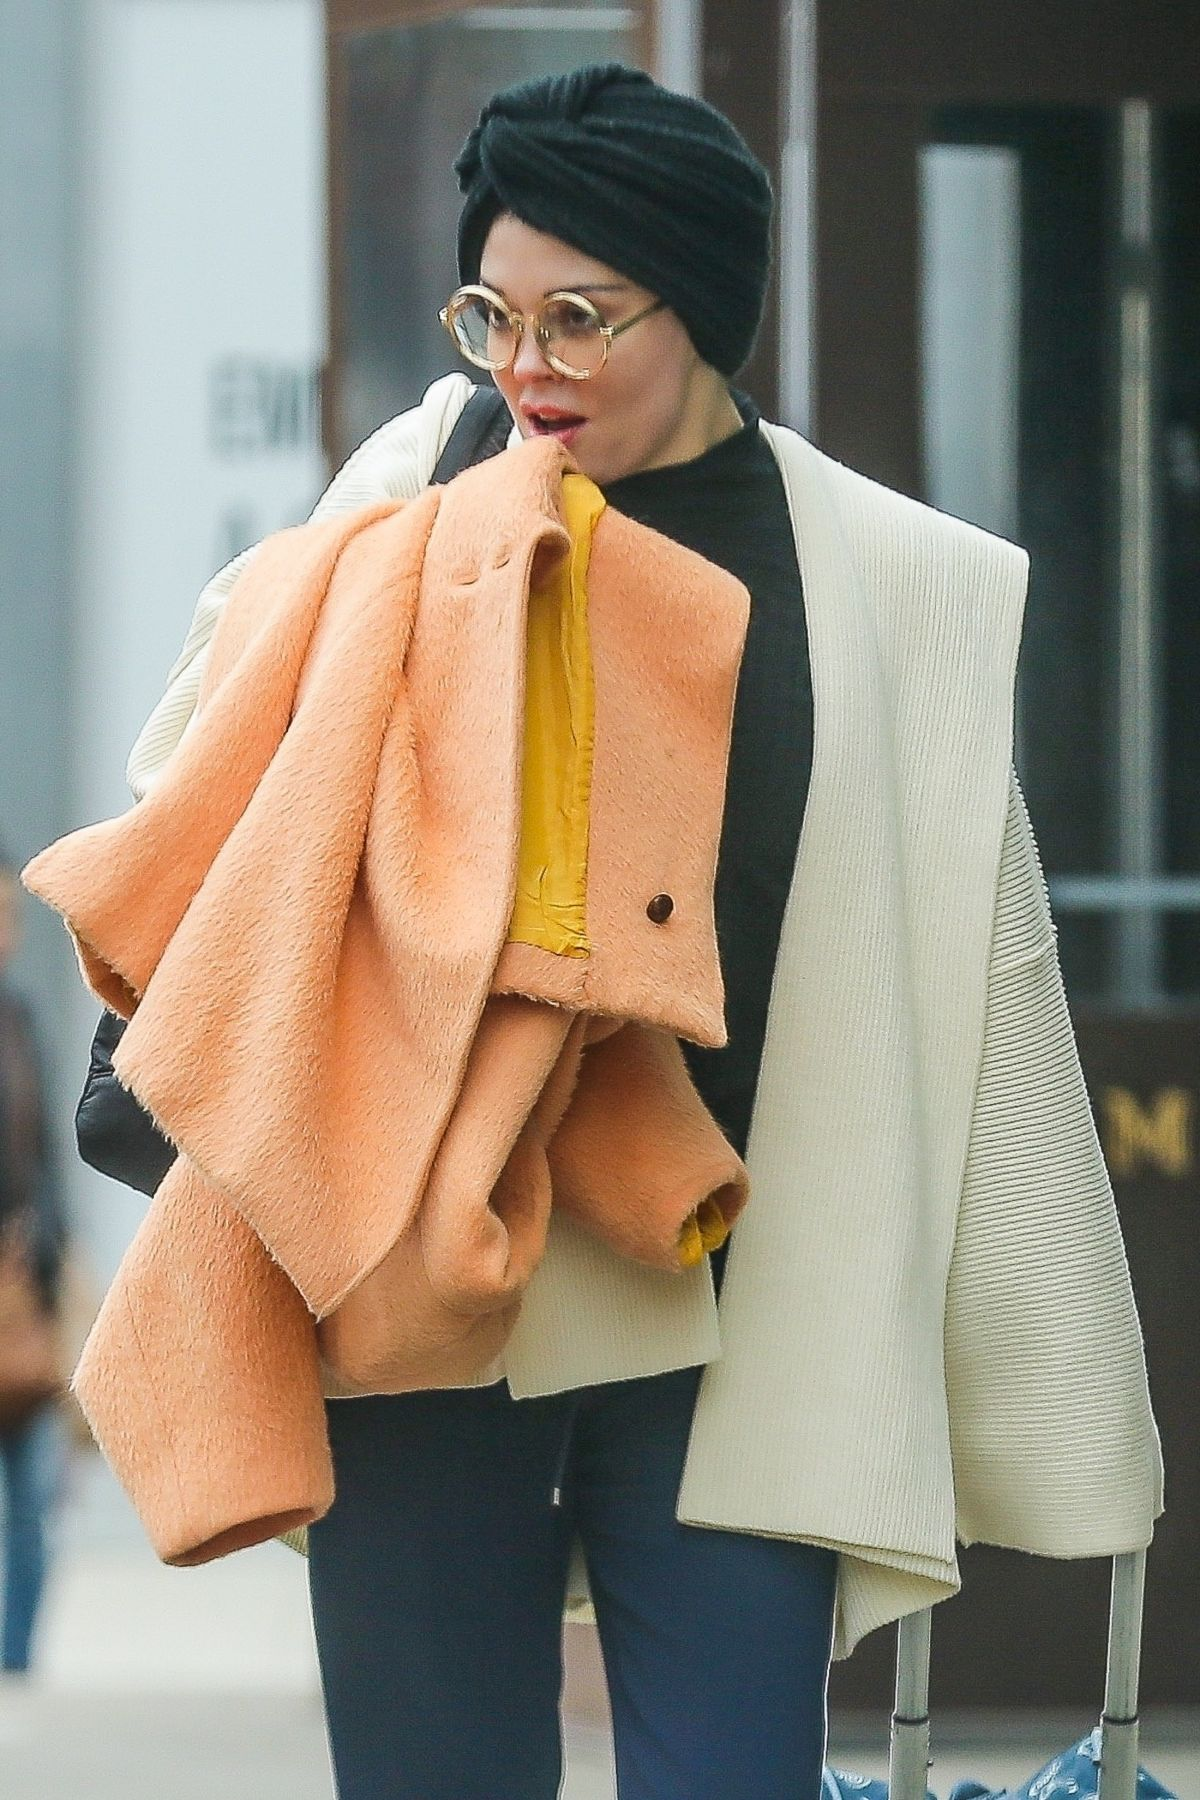 Ebay fashion app sunglasses Cached